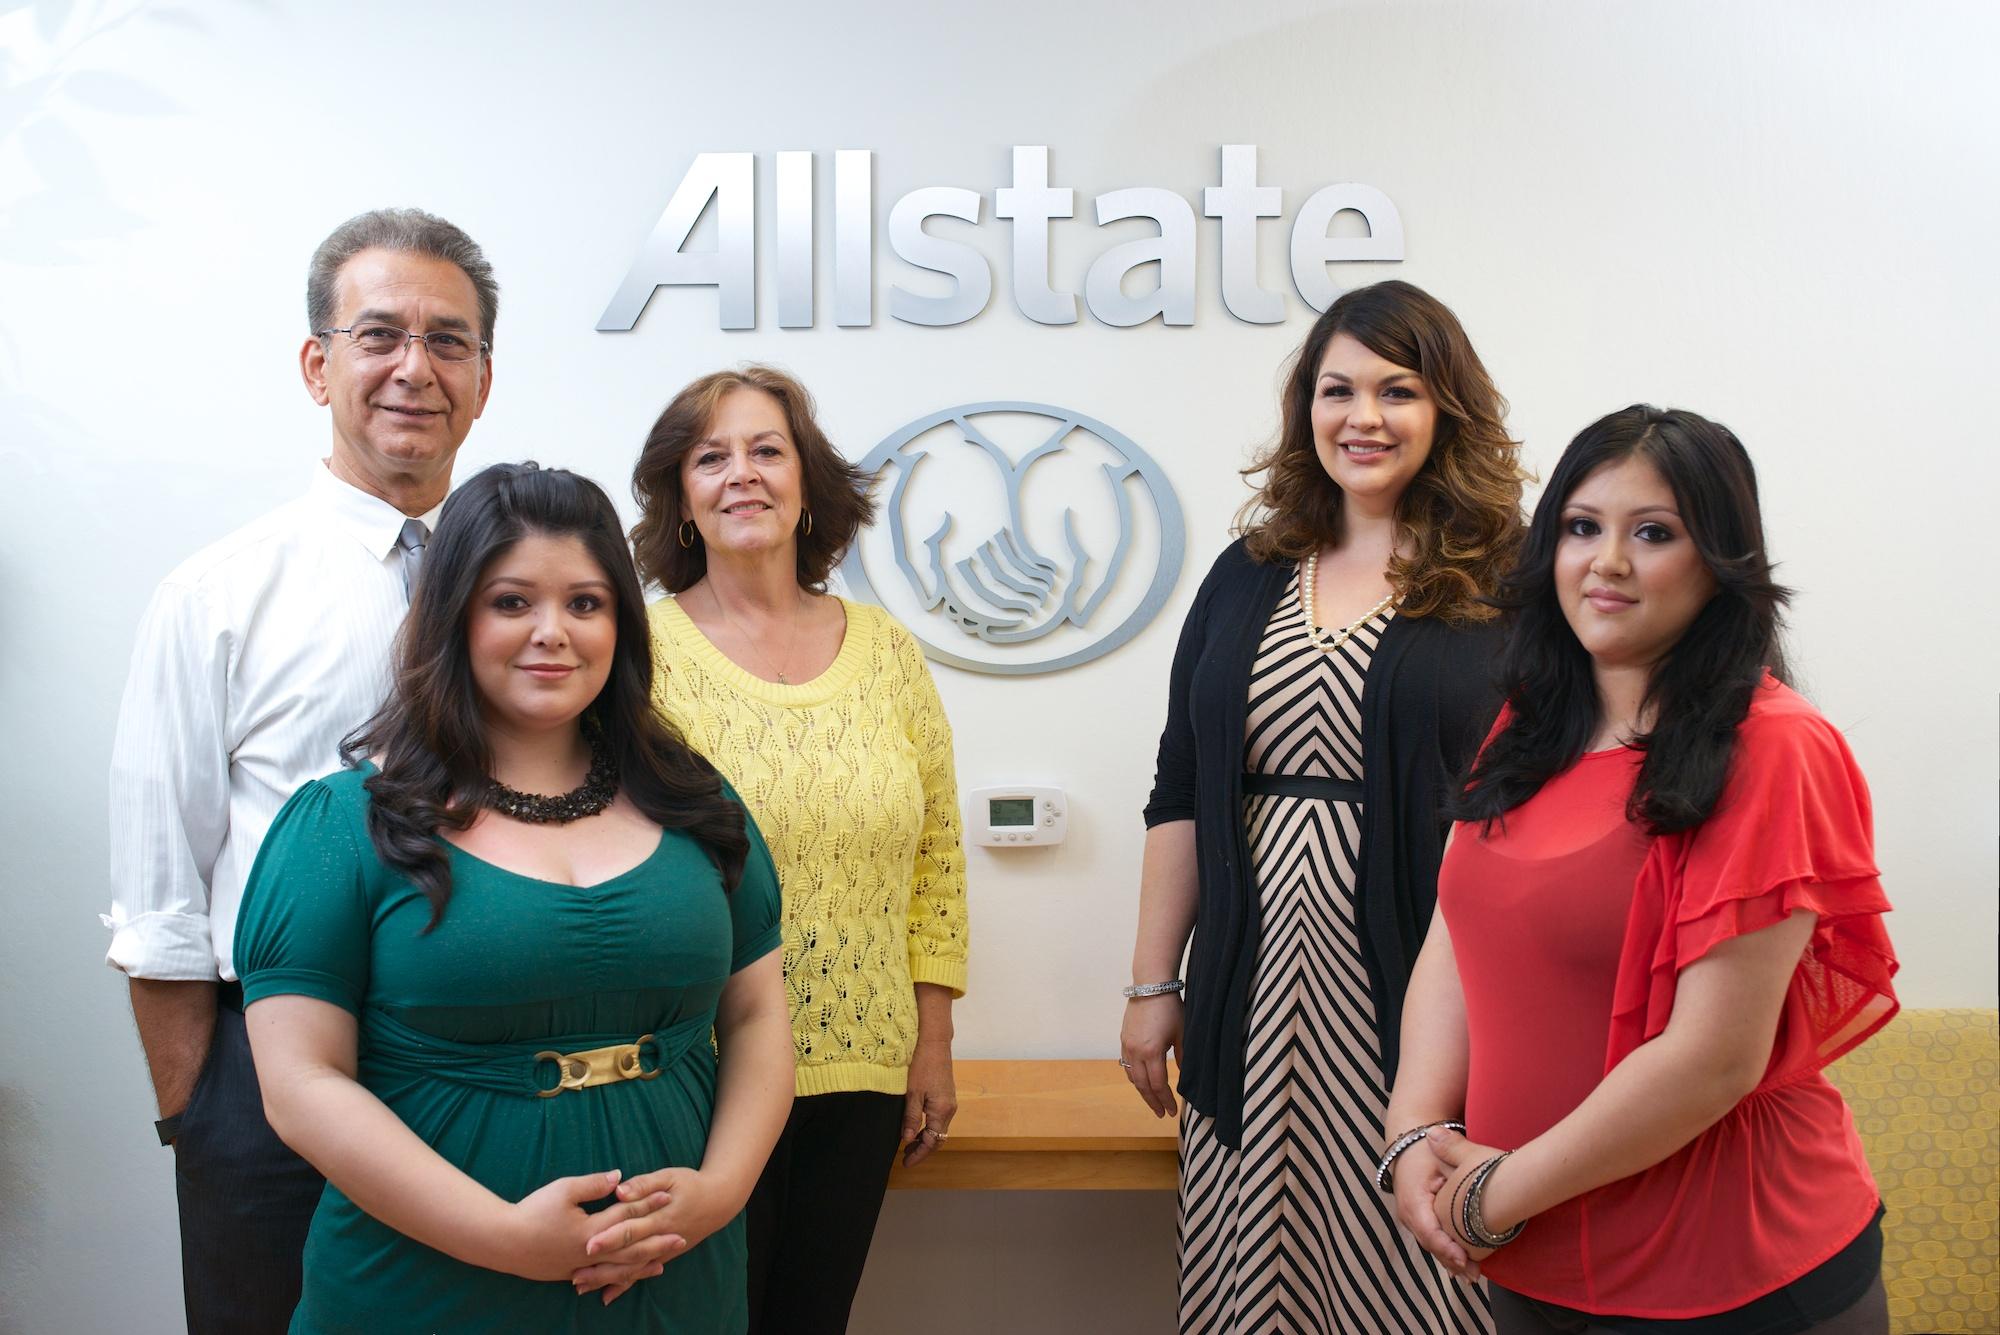 Laura Aguilera: Allstate Insurance image 1